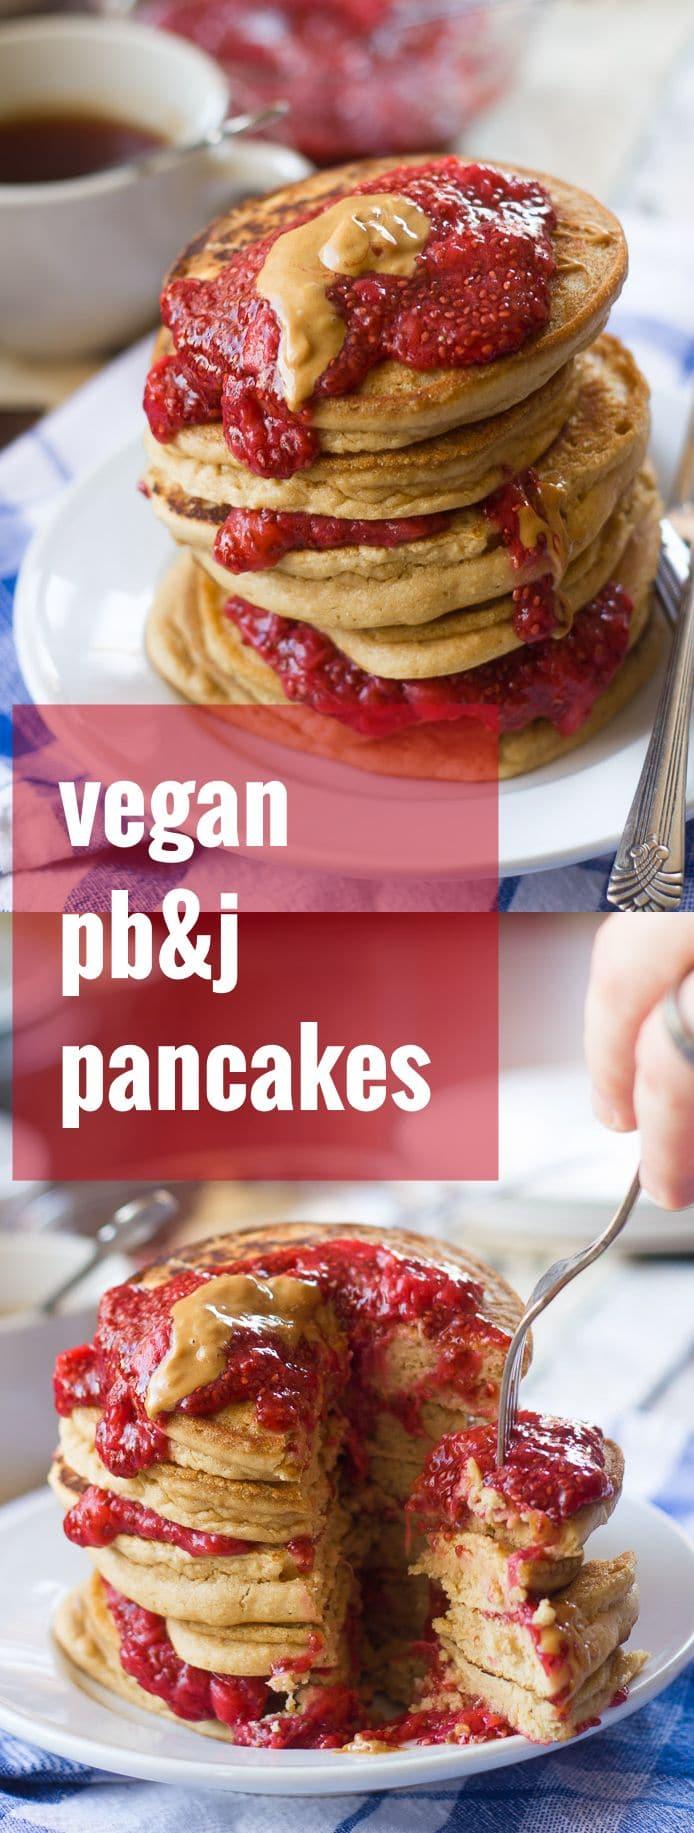 Vegan PB&J Pancakes